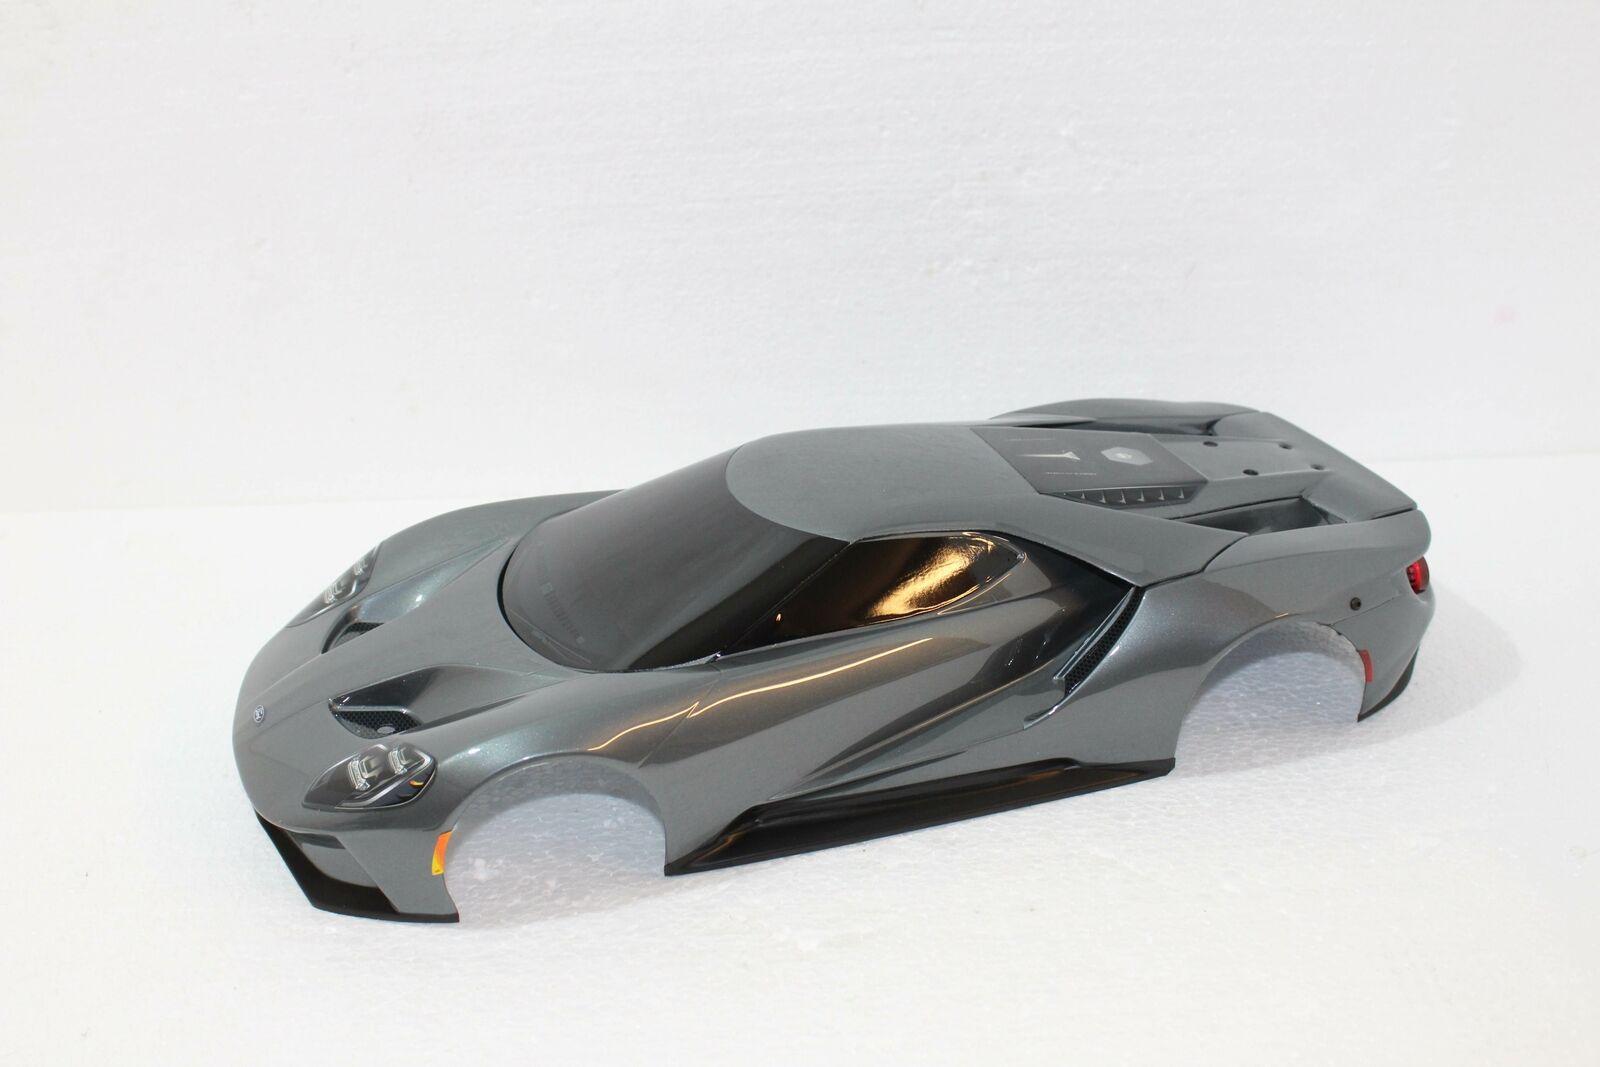 TRAXXAS FORD GT autoROZZERIA  argentooO trx8311  a buon mercato